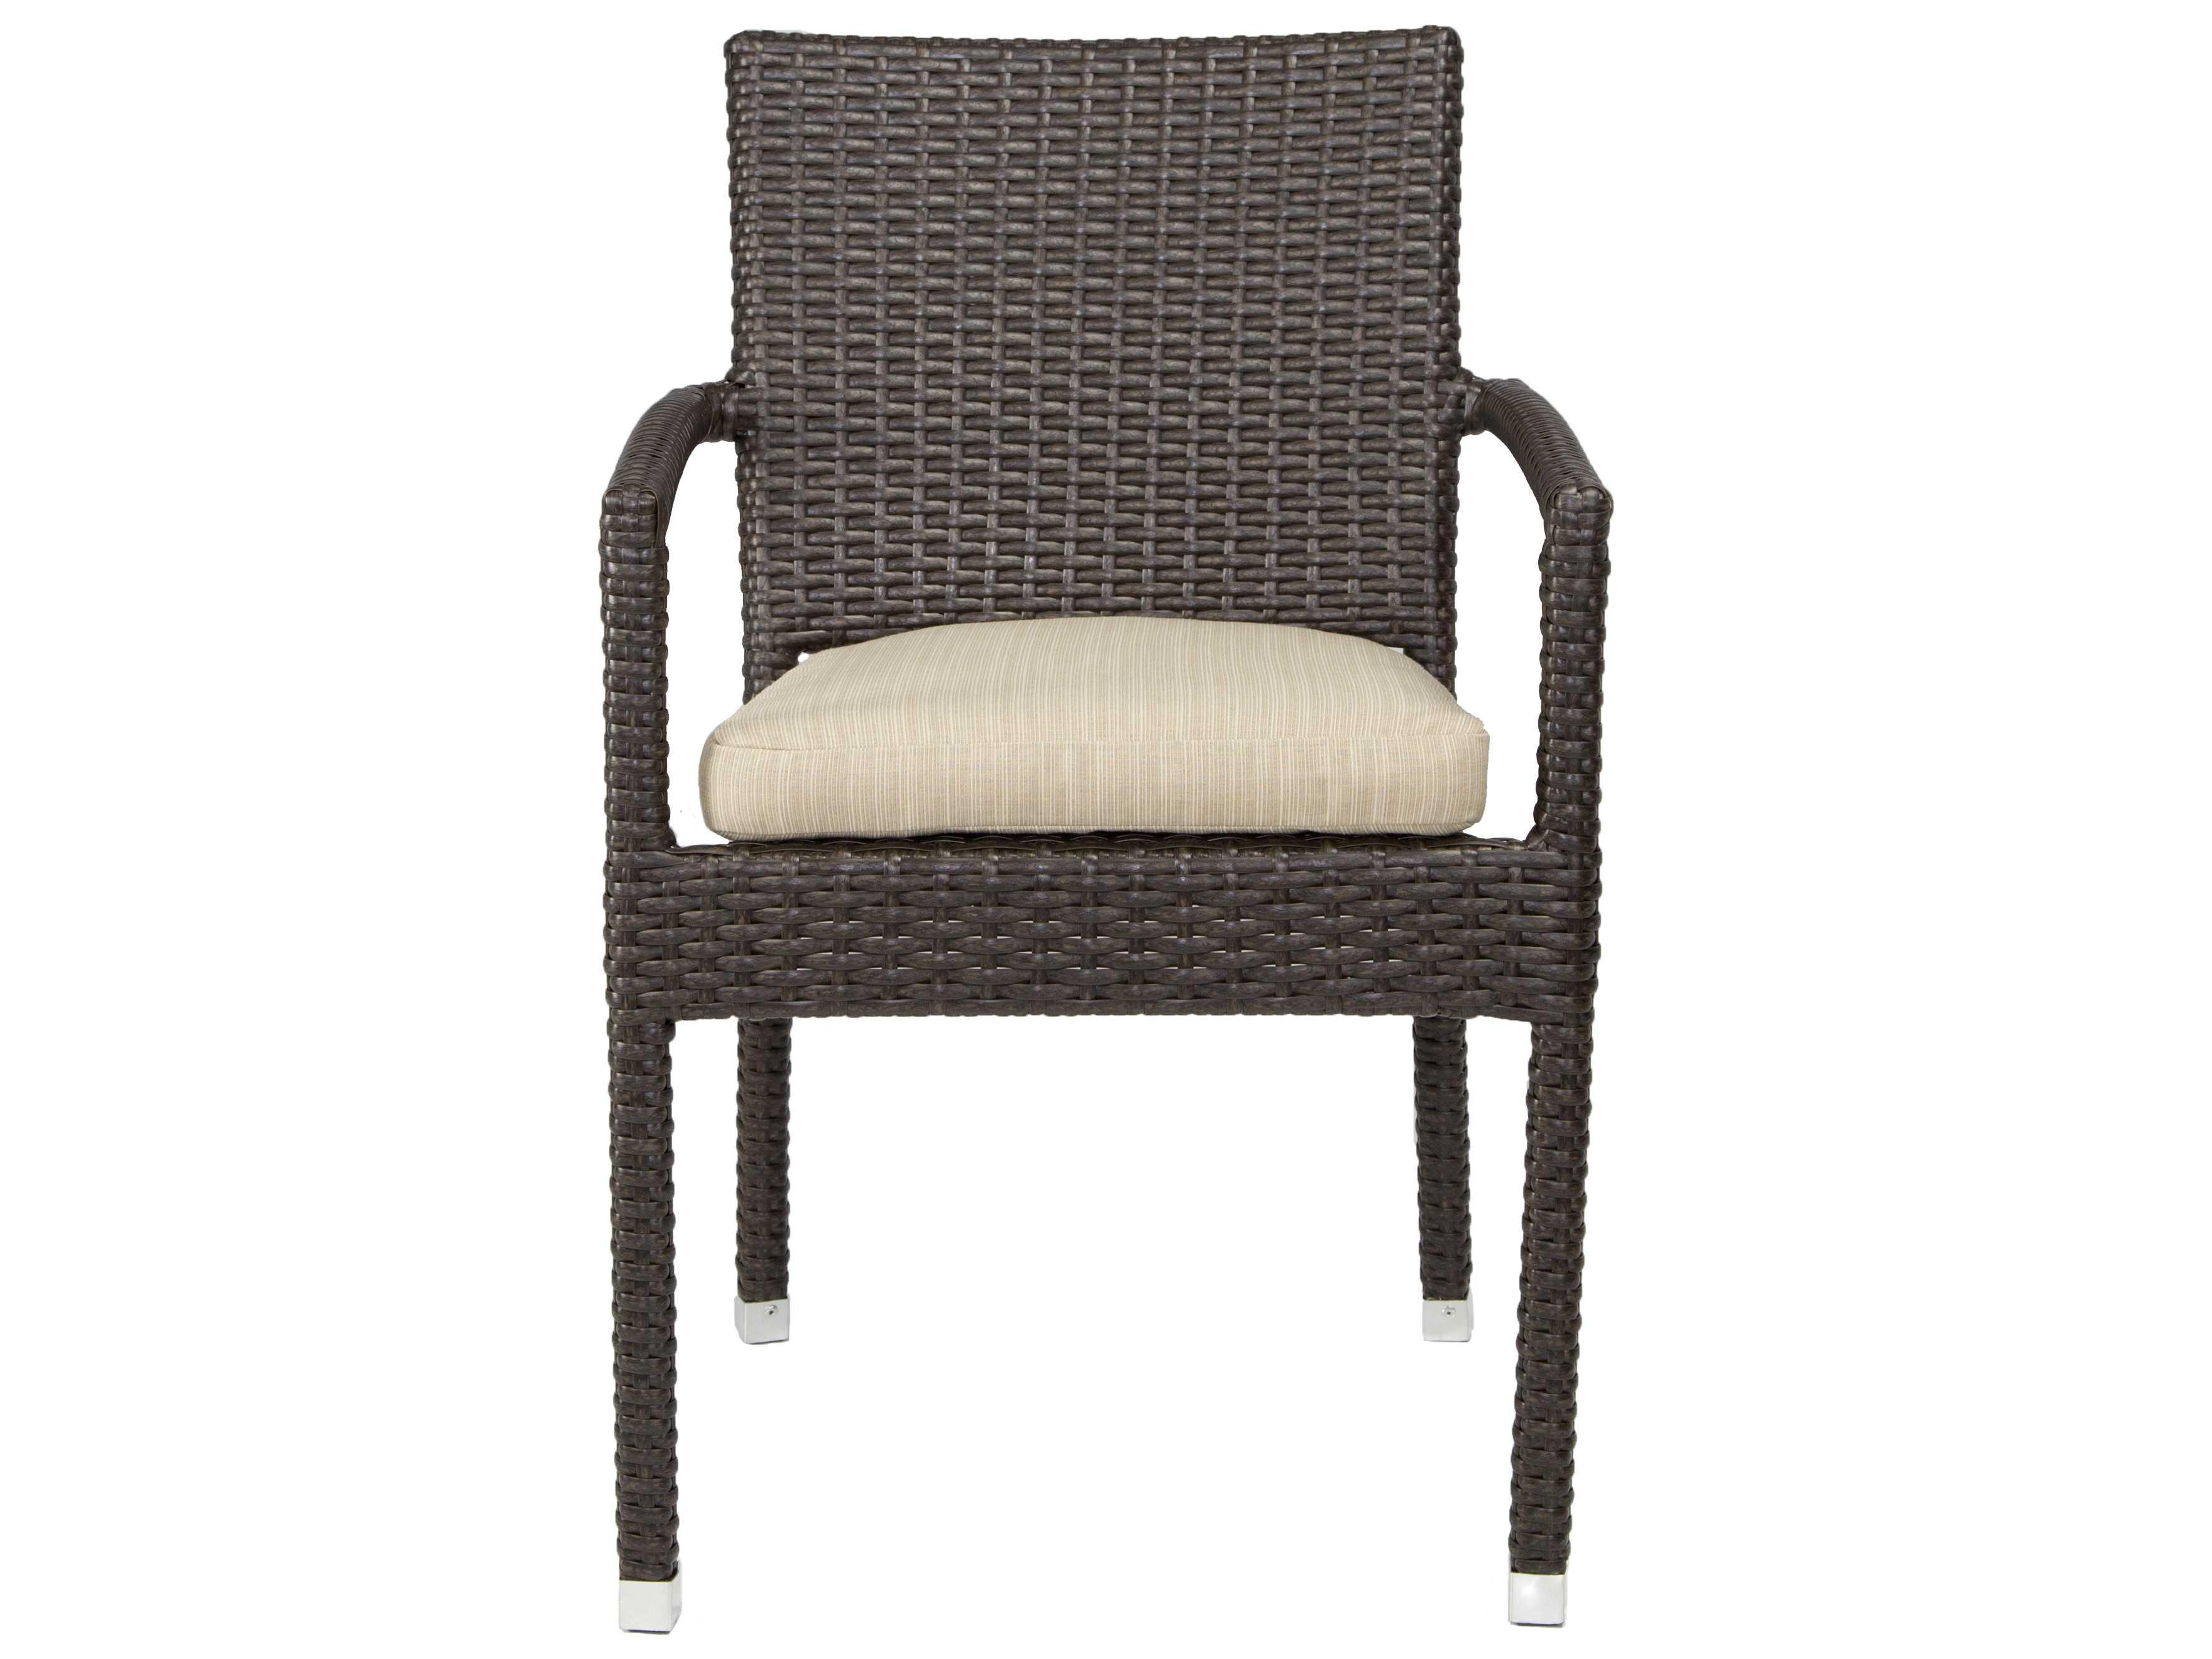 Patio heaven zuma wicker arm chair ph zac for Patio heaven